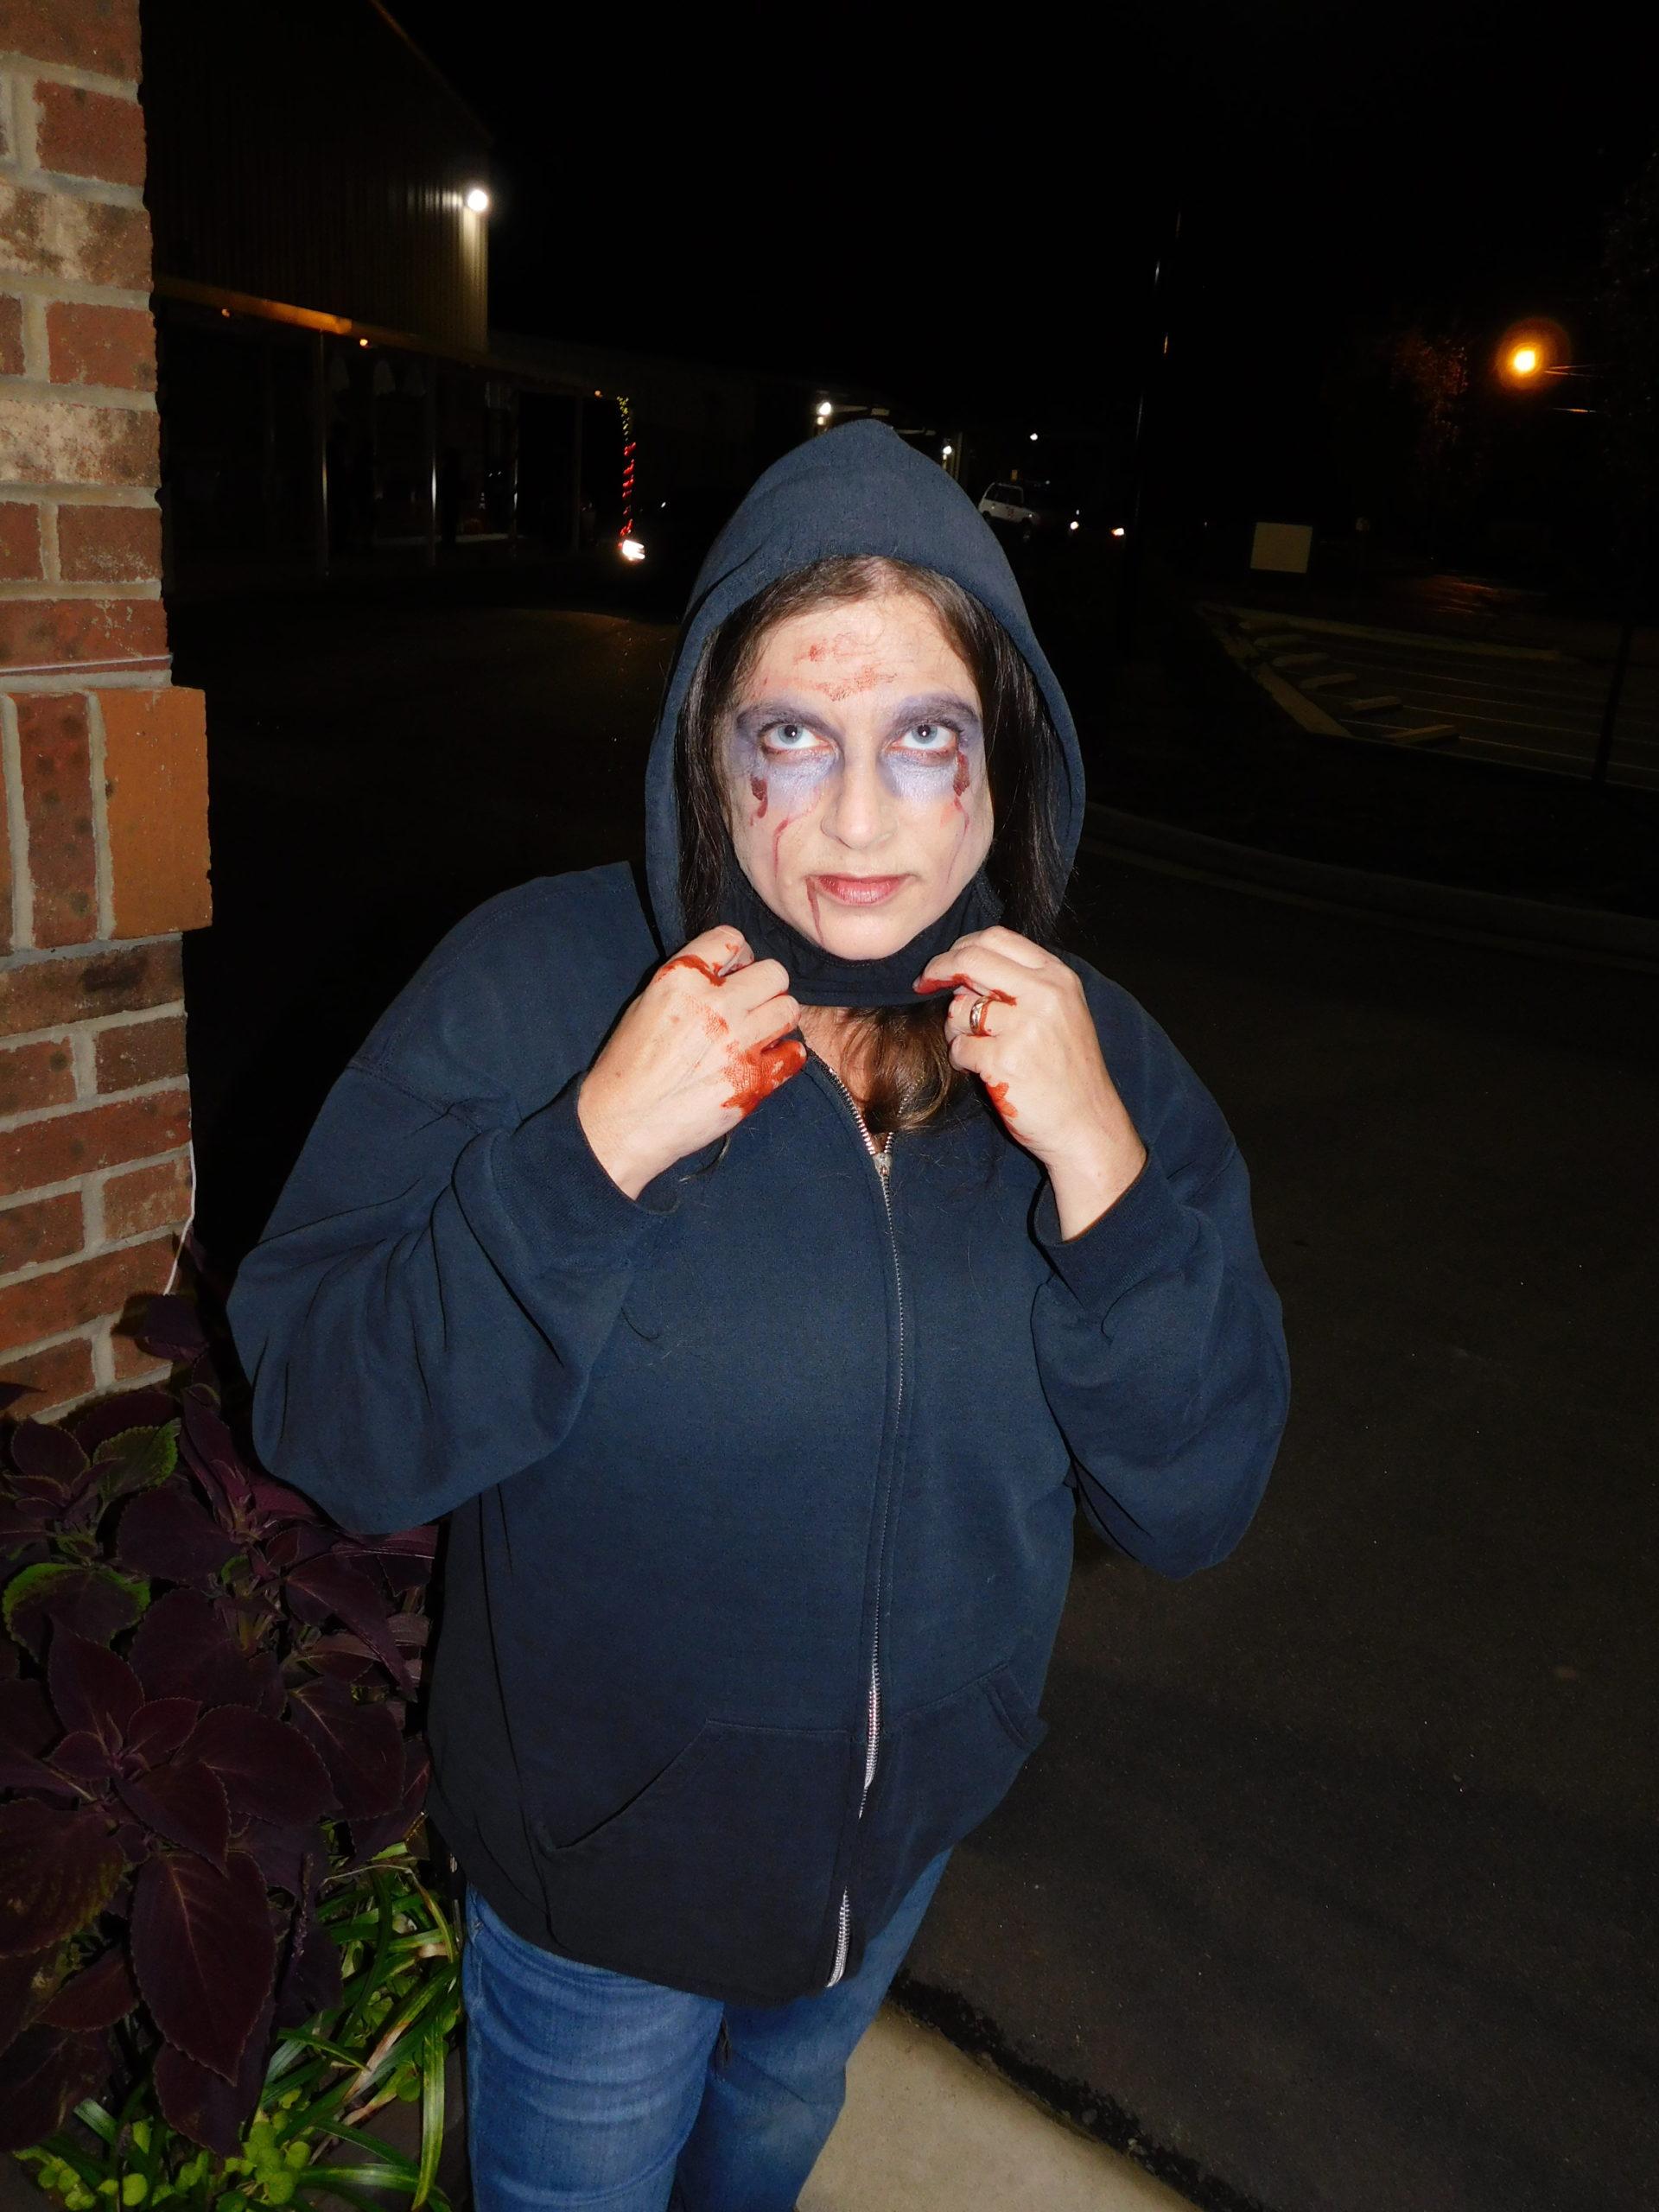 Mrs. Lazar's zombie face